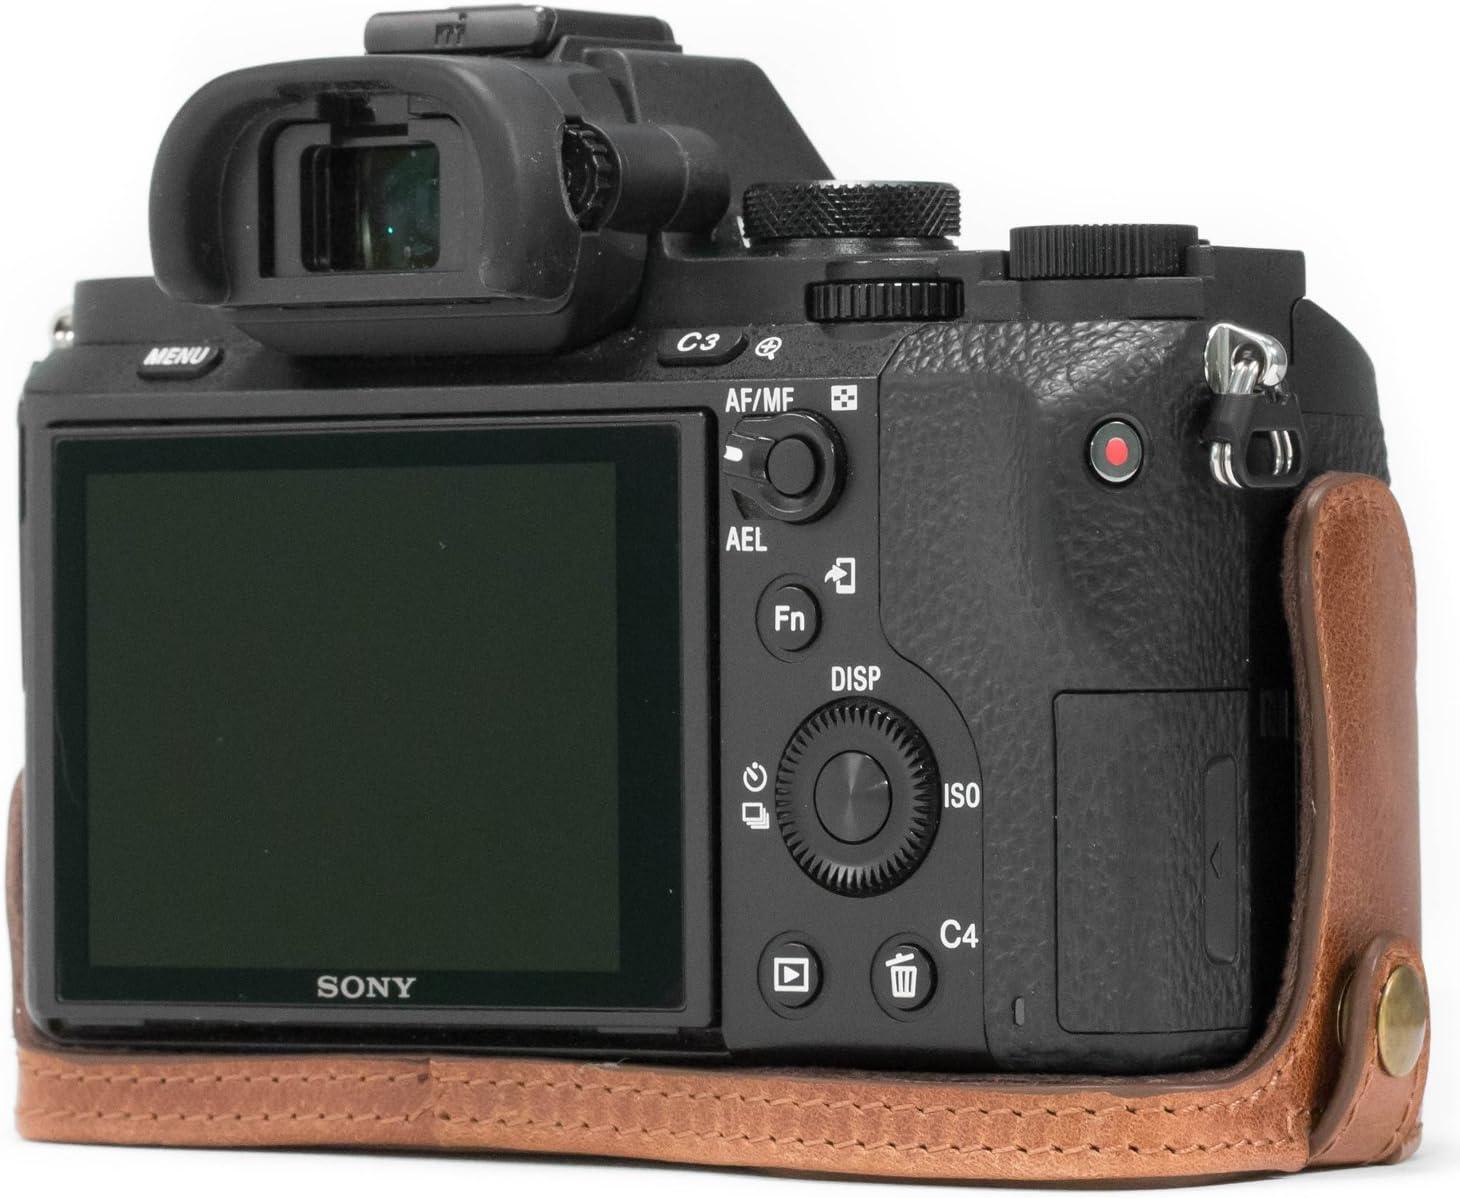 MegaGear Ever Ready Echtleder Kameratasche mit Trageriemen kompatibel mit Sony Alpha A7S II A7 II A7R II